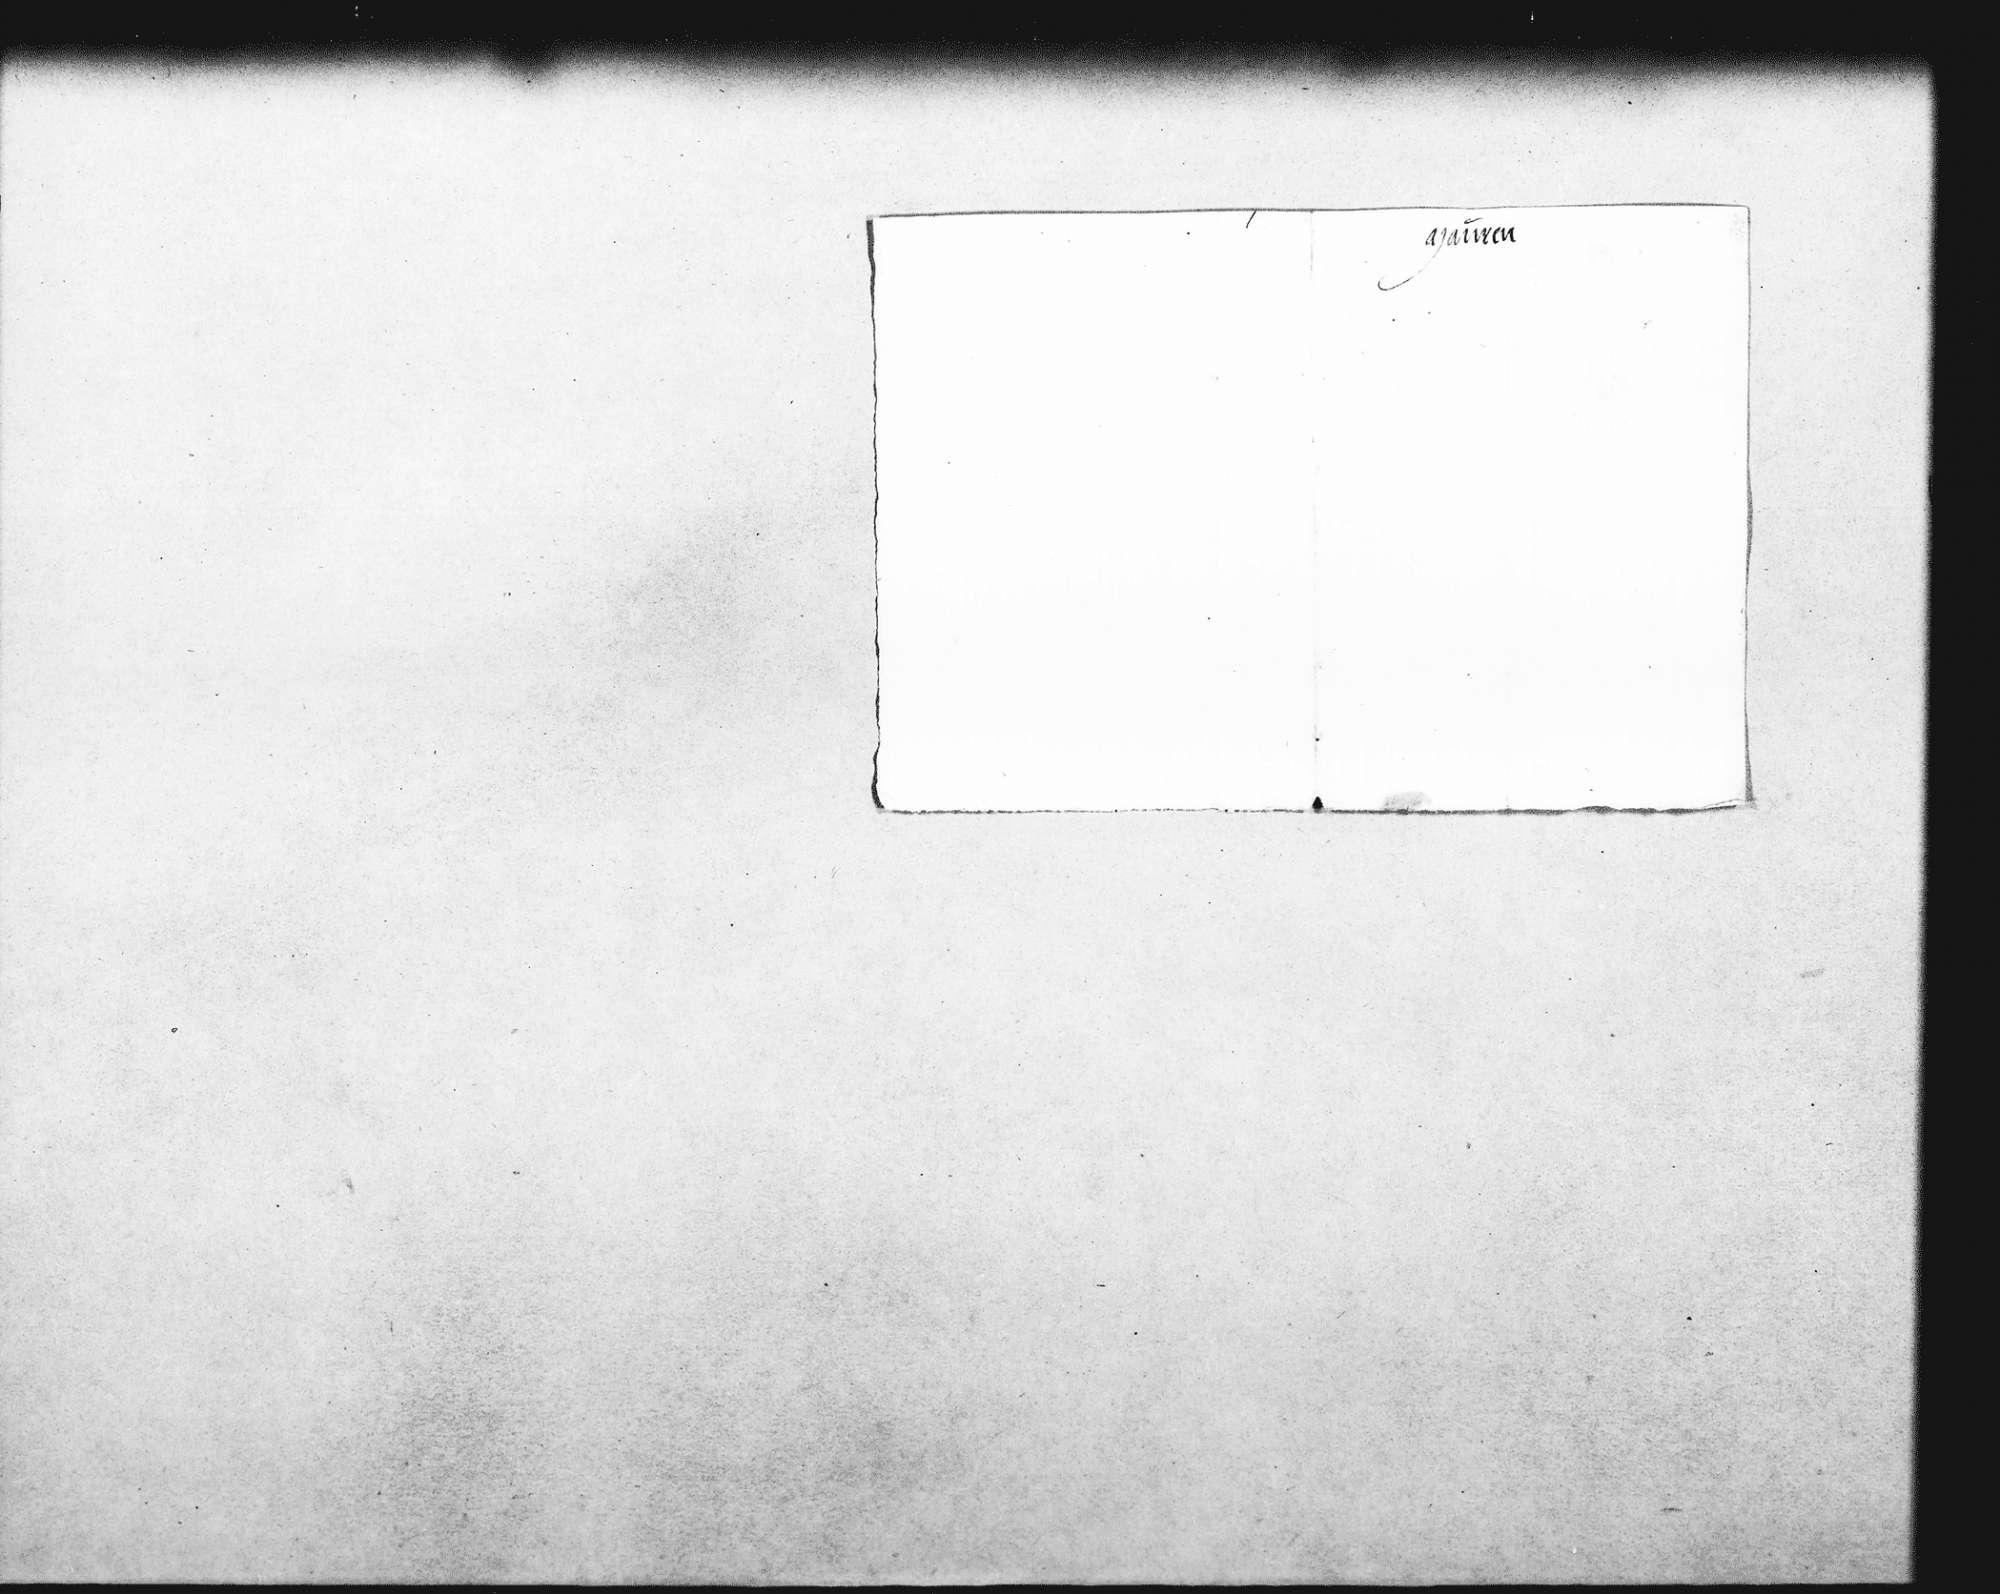 Erneuerung des Pfarrhauses in Mauren (Quart), Bild 2